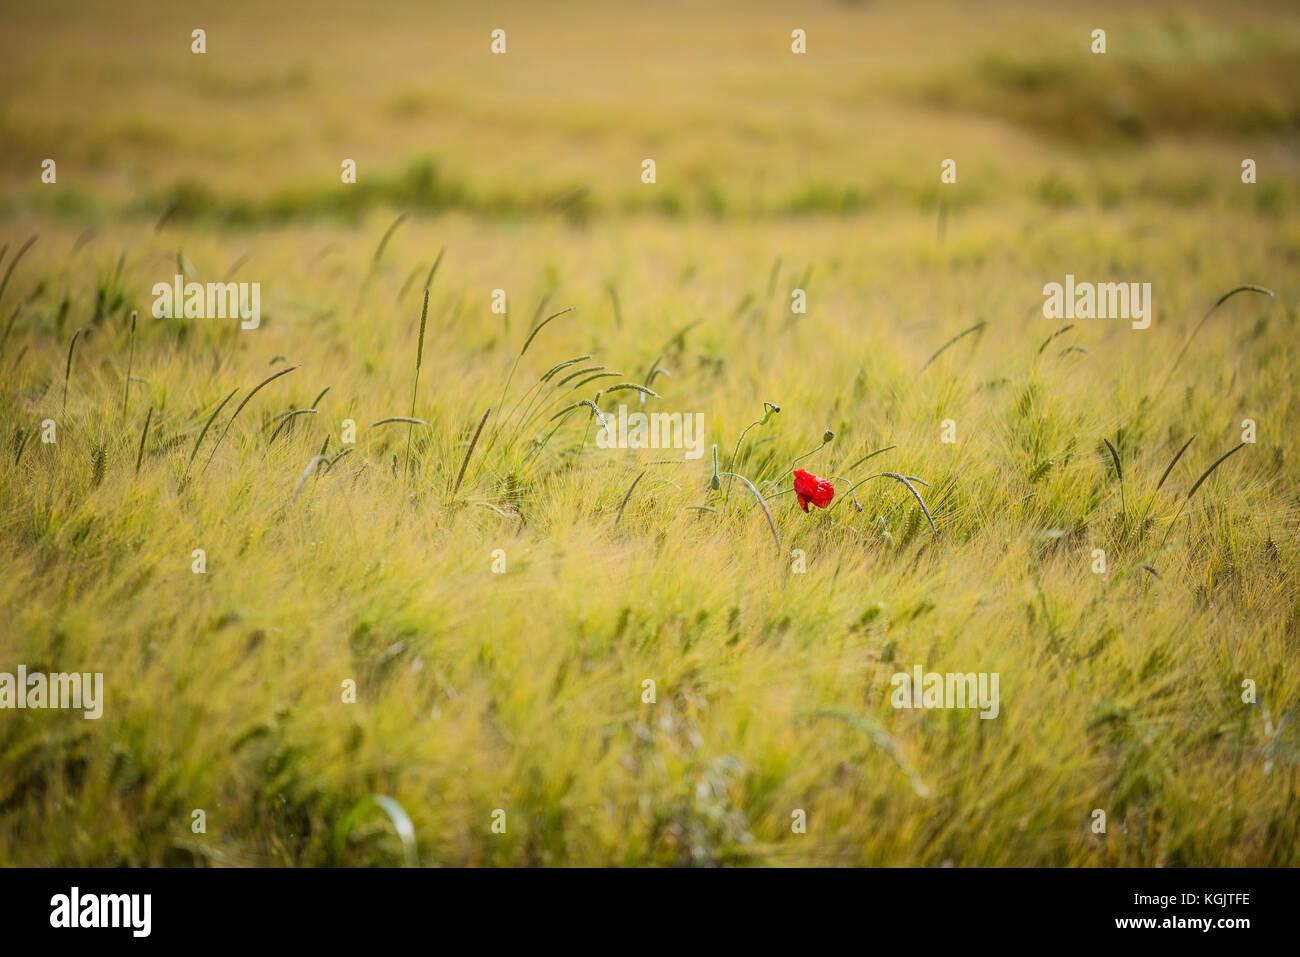 Single red poppy in a field. Stock Photo